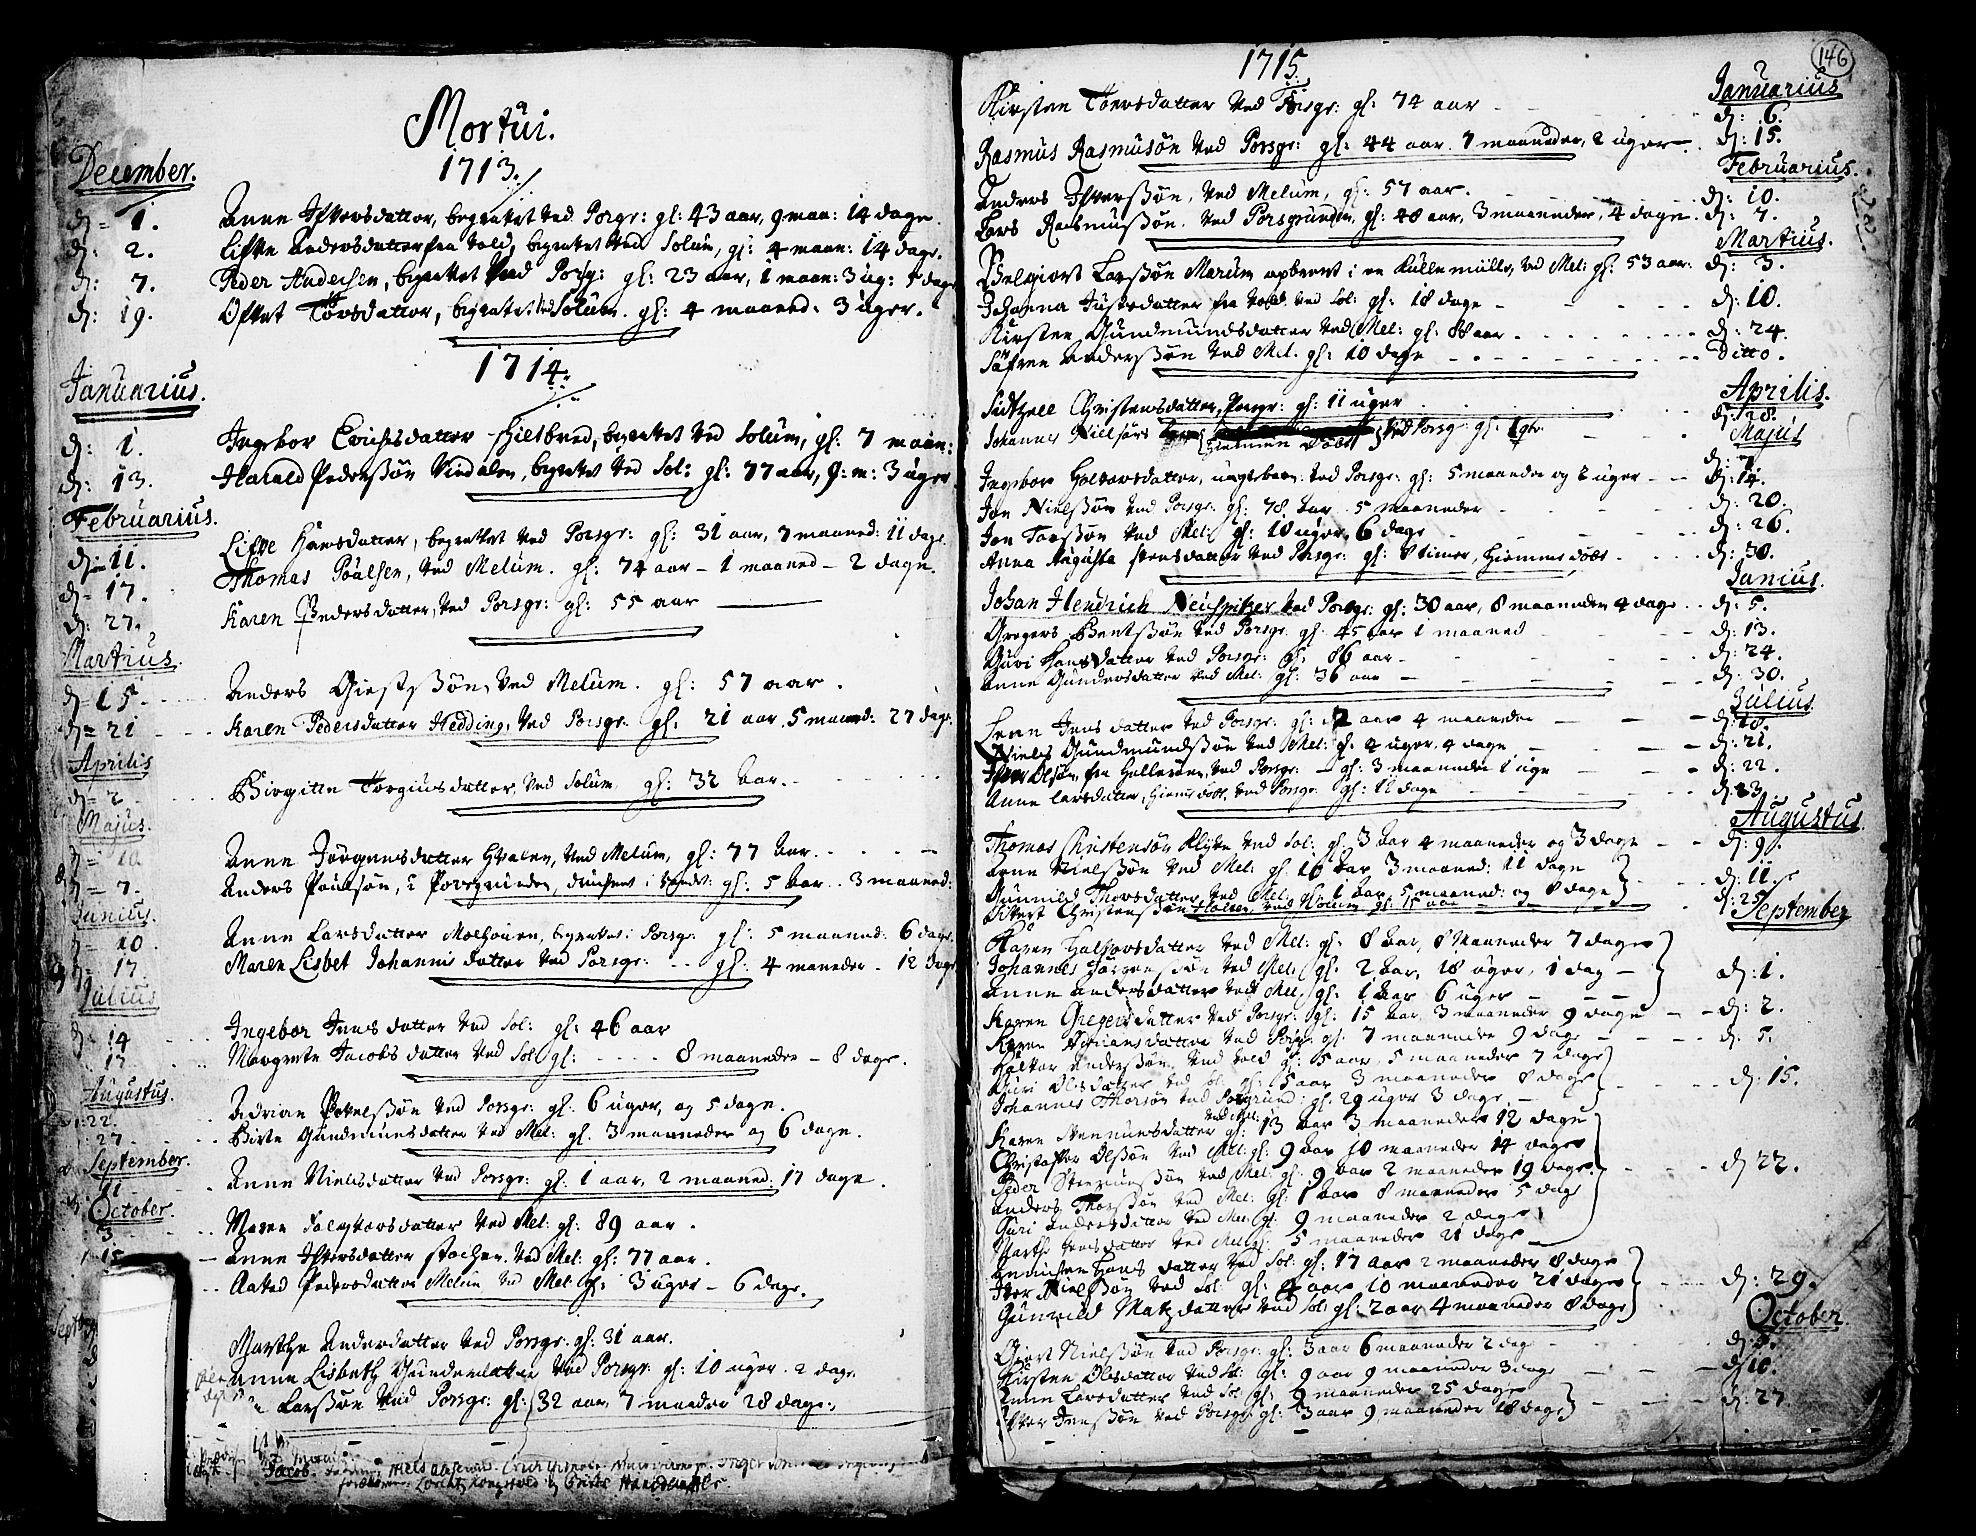 SAKO, Solum kirkebøker, F/Fa/L0002: Ministerialbok nr. I 2, 1713-1761, s. 146